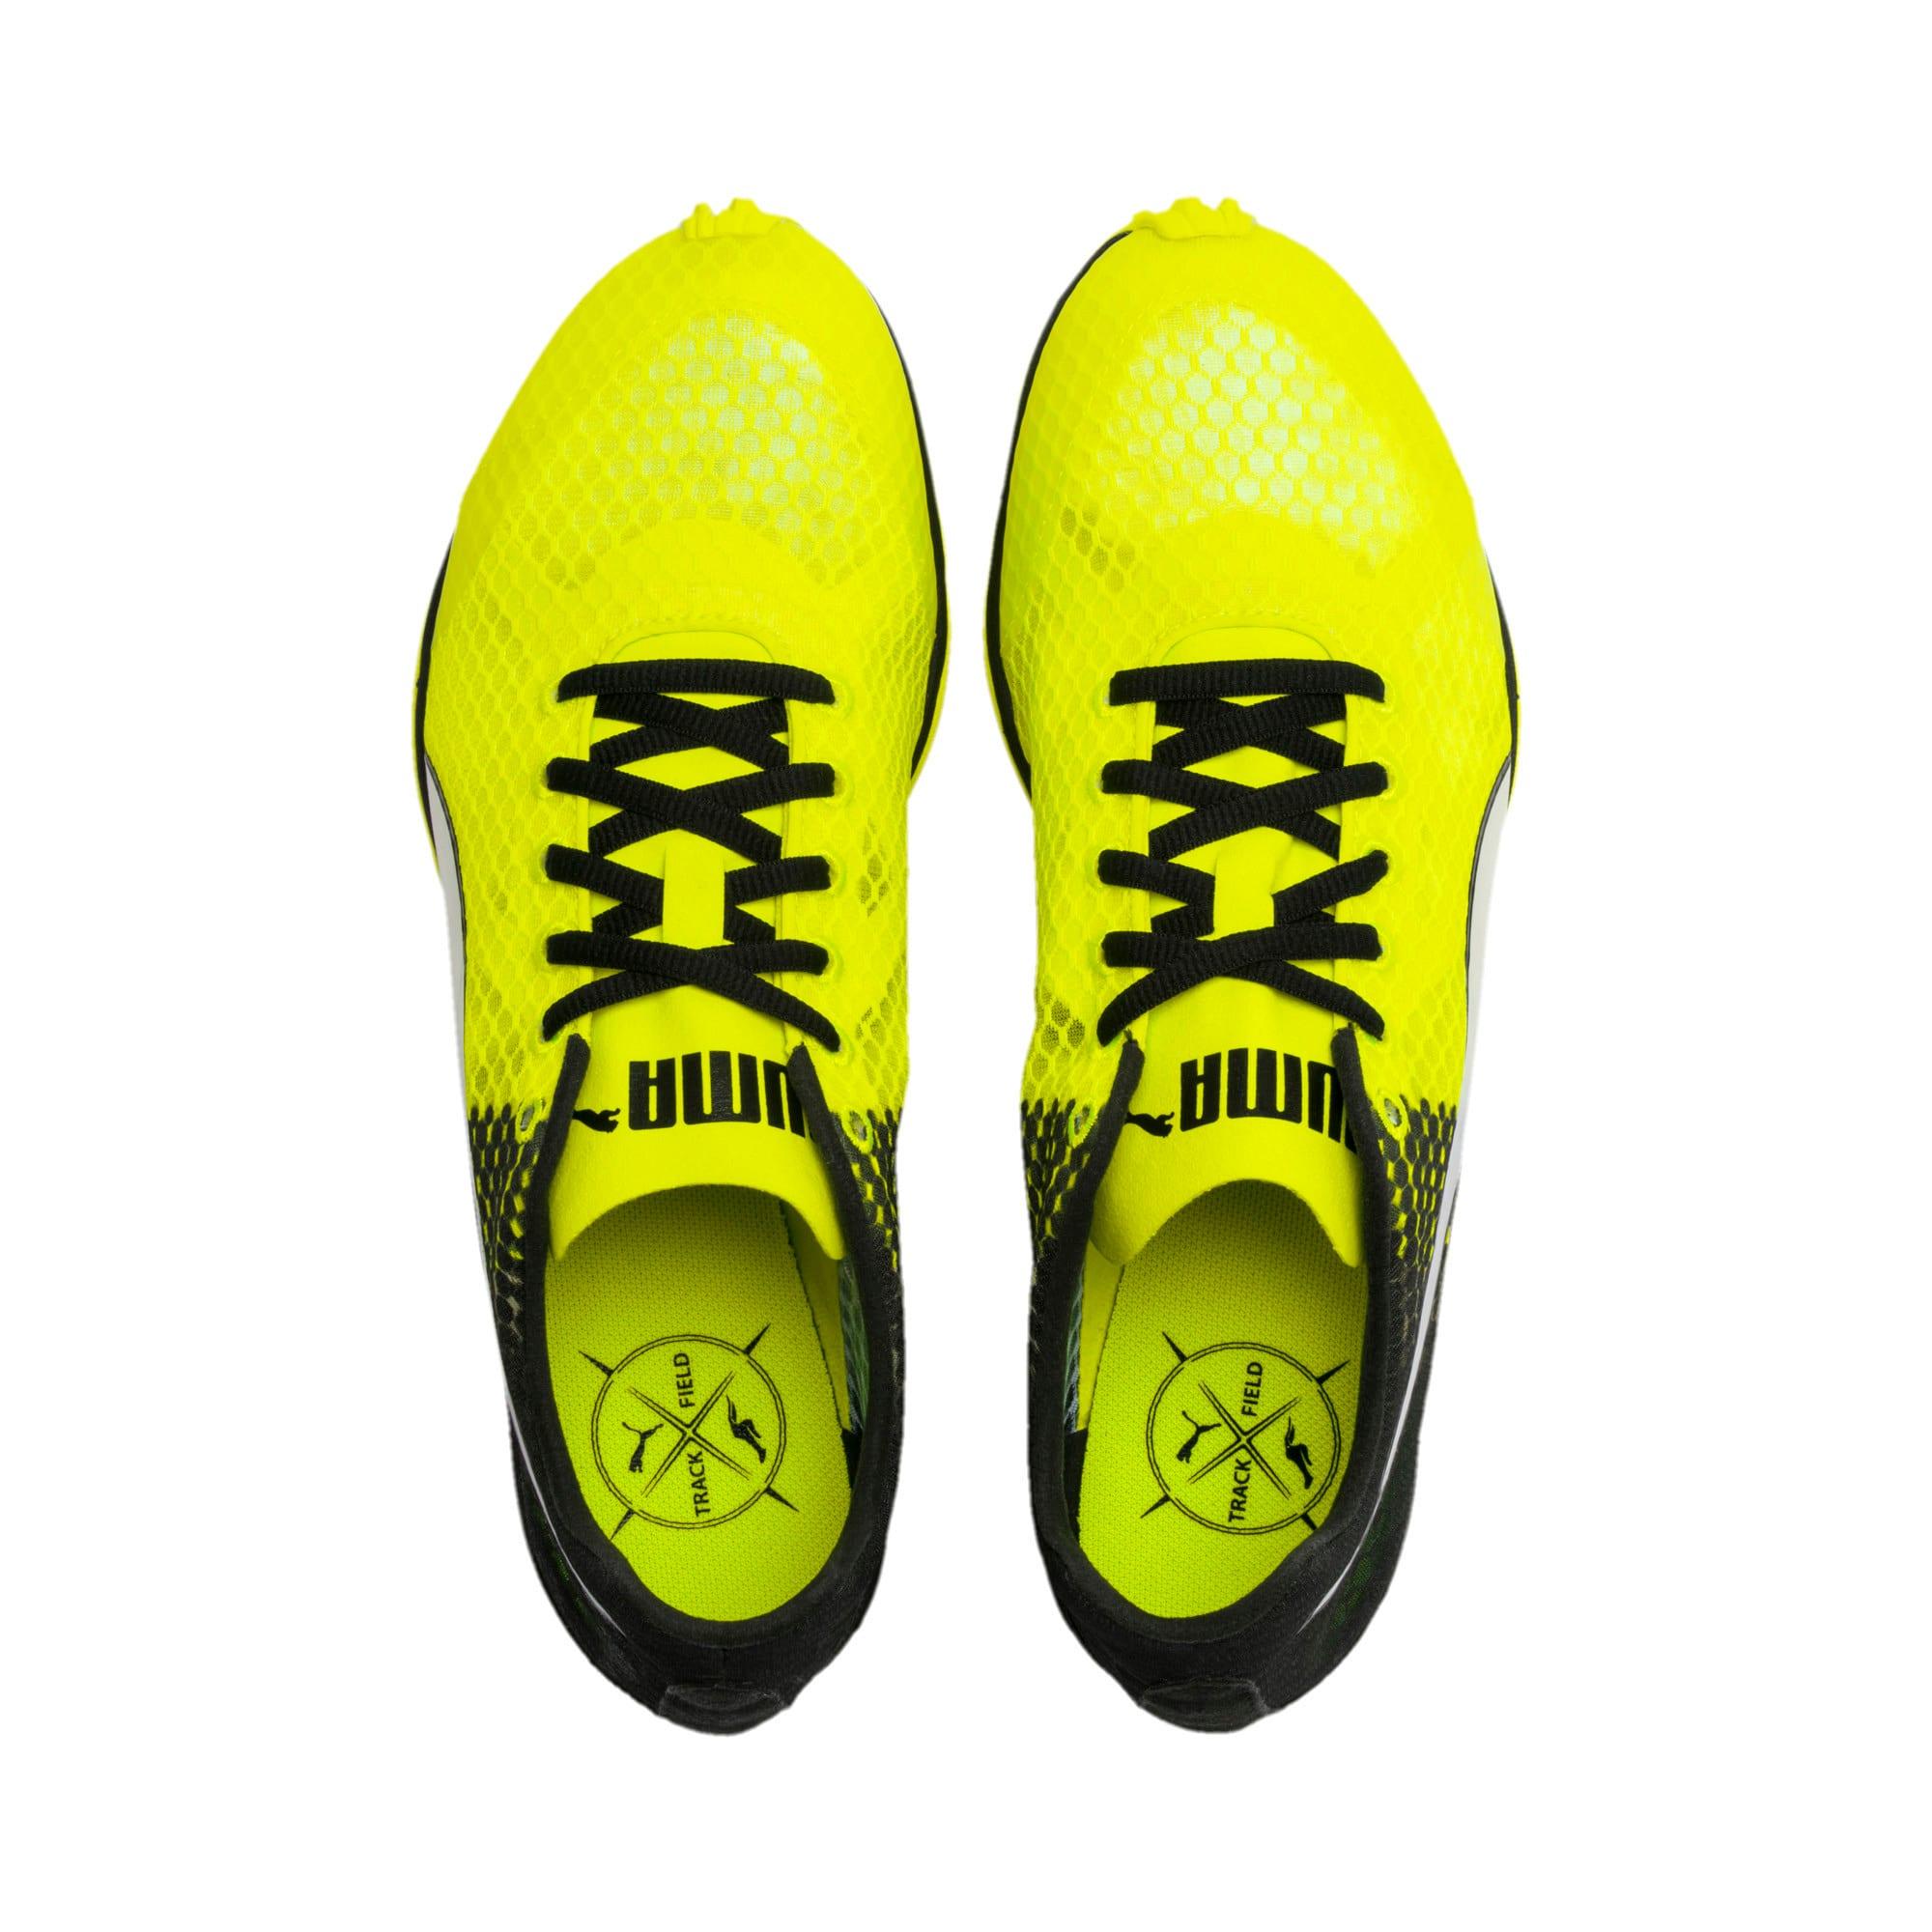 Thumbnail 2 of evoSPEED Haraka 6 Track and Field Boots, Yellow Alert-Black-White, medium-IND